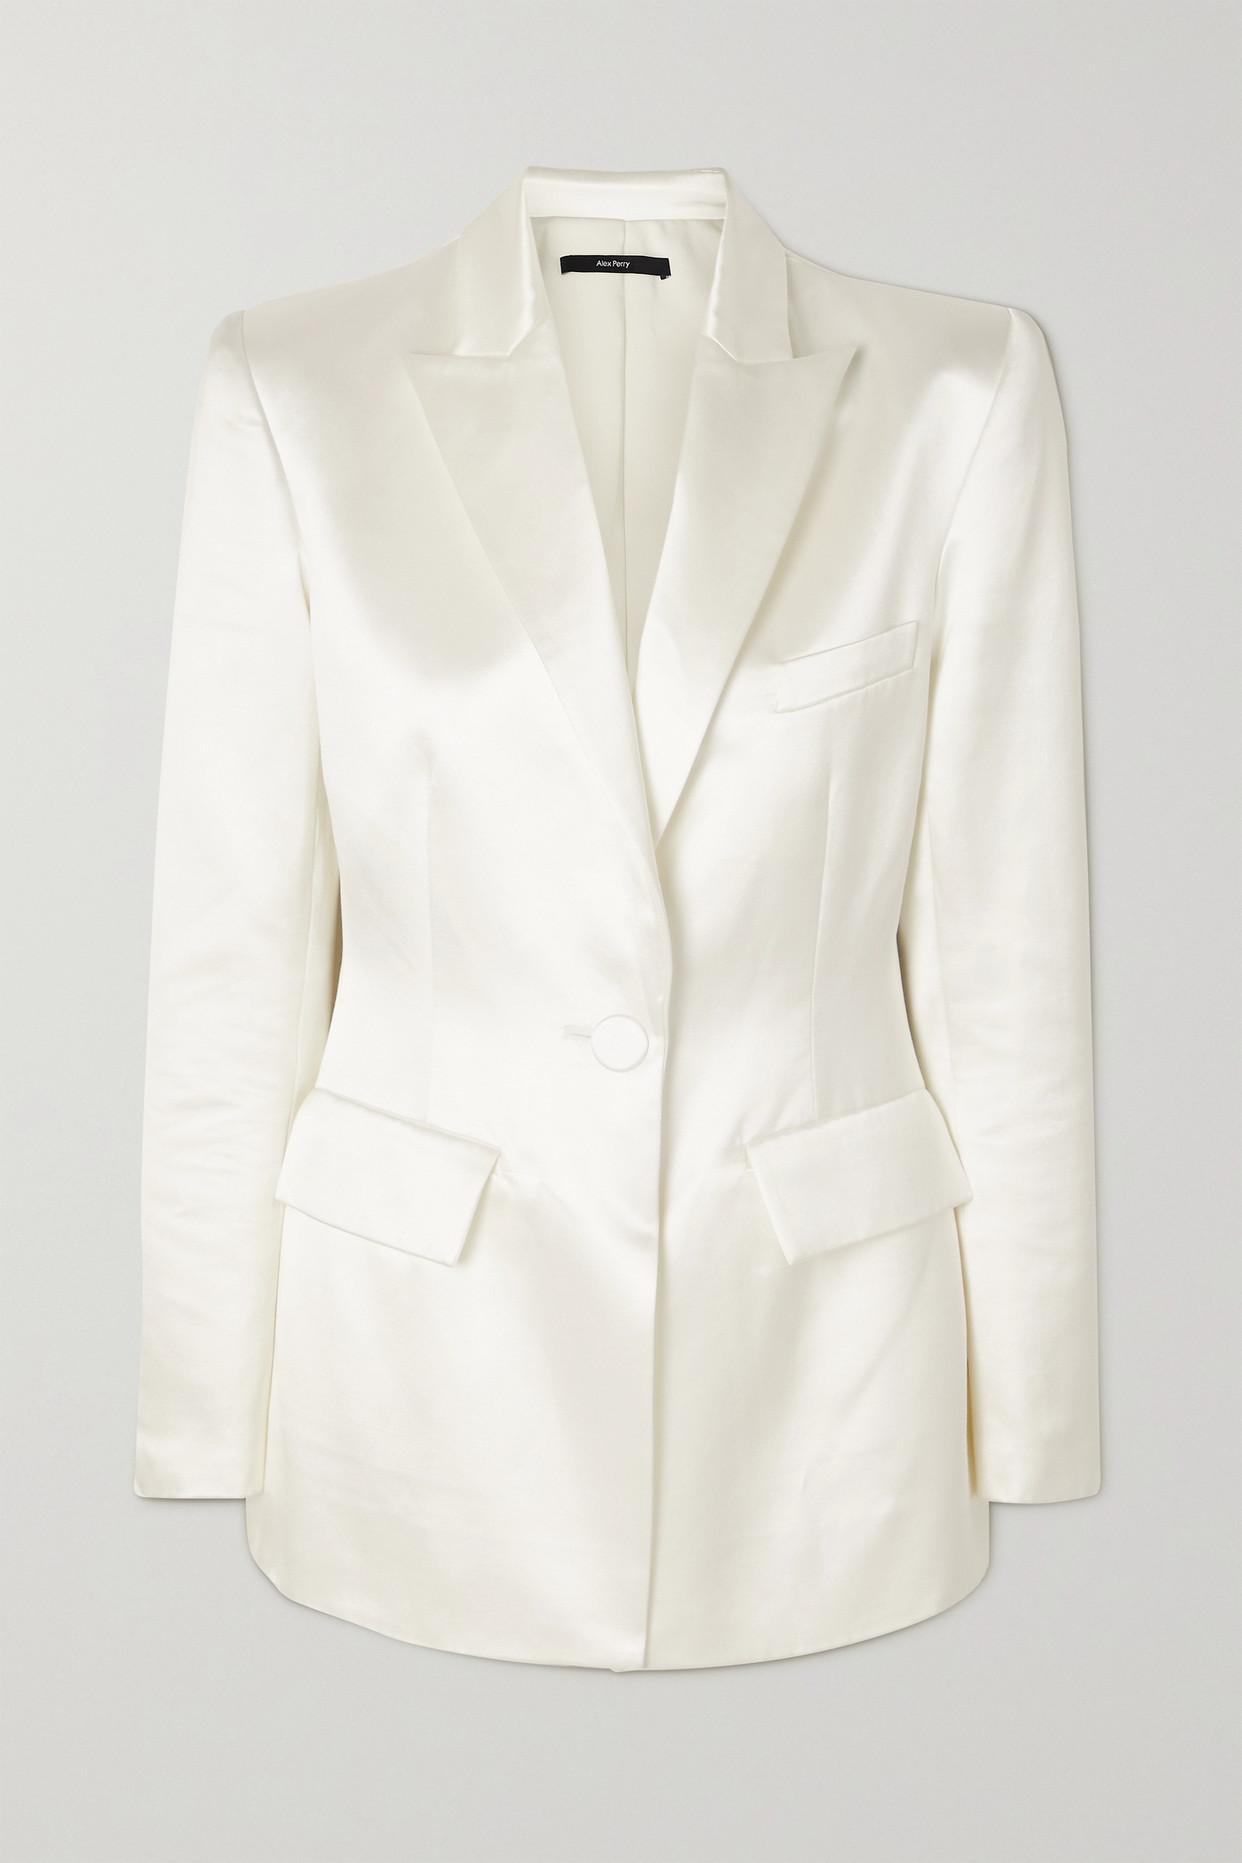 ALEX PERRY - Banks Cotton And Silk-blend Duchesse-satin Blazer - White - UK10